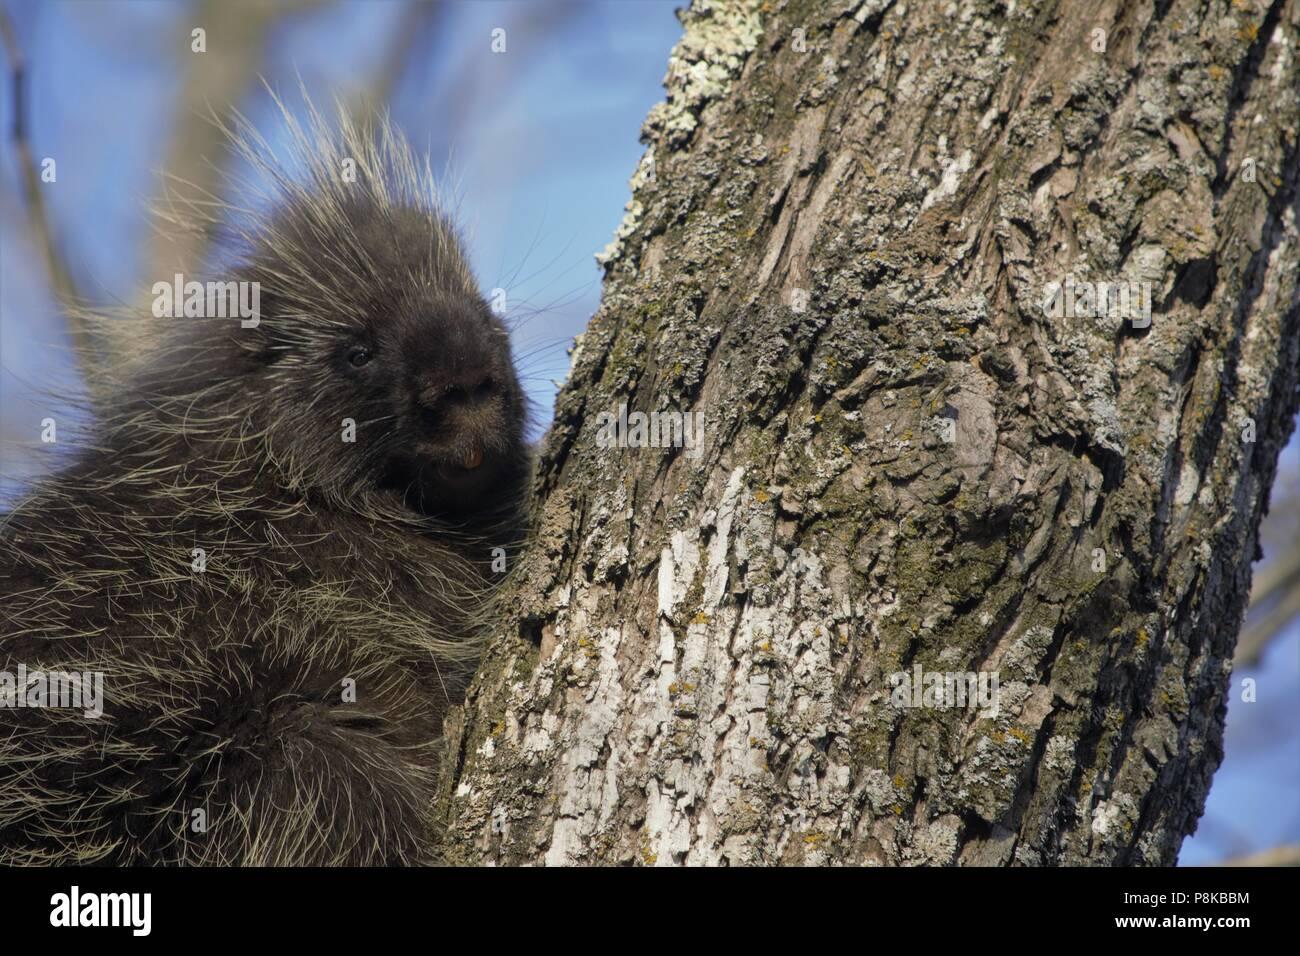 Erethizon dorsatum (North American Porcupine) Stock Photo